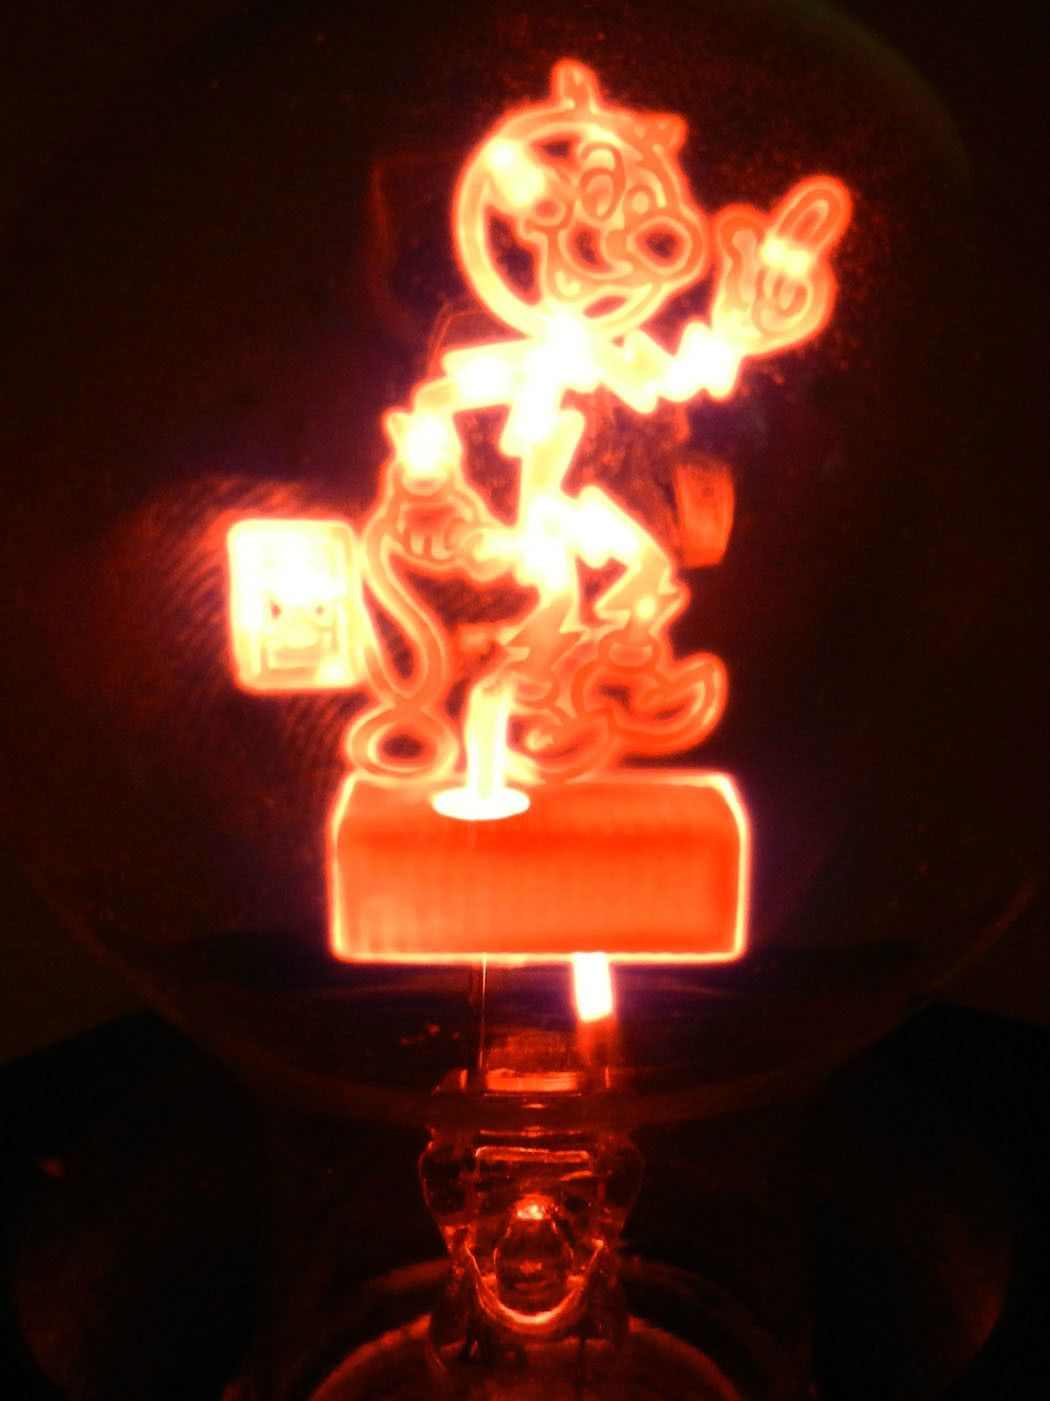 Reddy Kilowatt Aerolux Figural Filament Light Bulb And Lamp Working  Condition   EBay